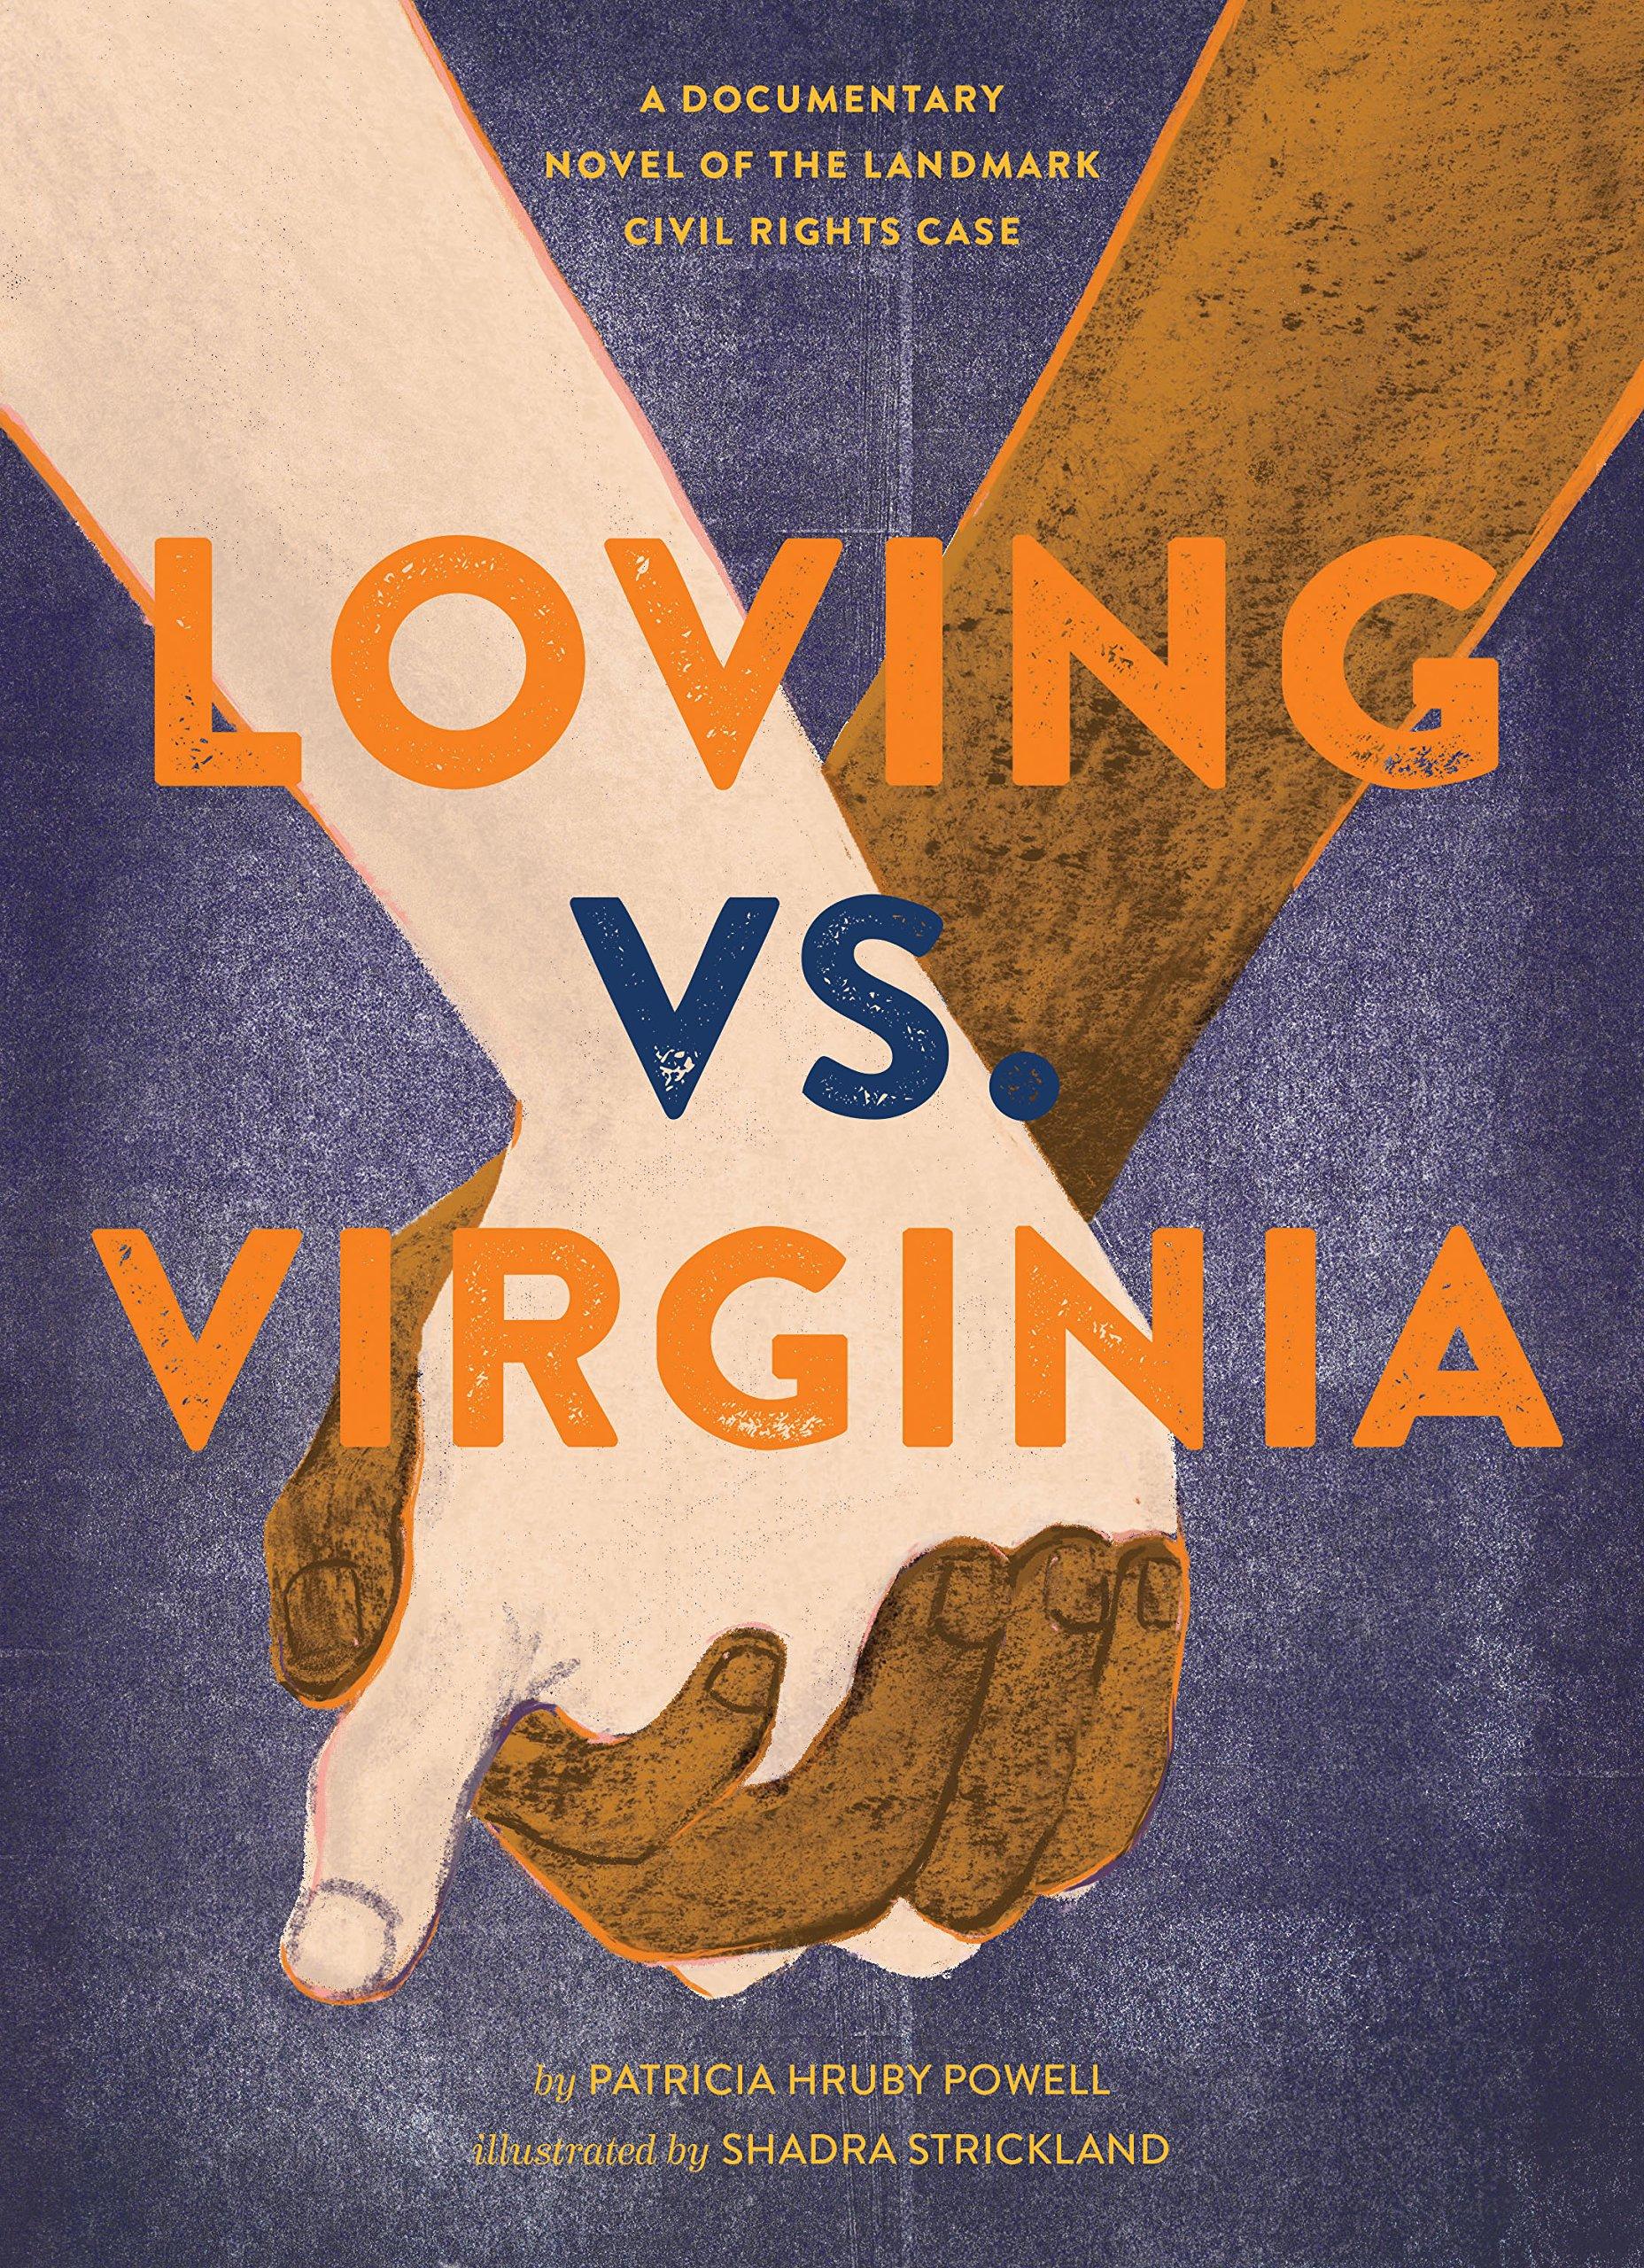 Loving vs. Virginia: A Documentary Novel of the Landmark Civil Rights Case by Patricia Hruby Powell